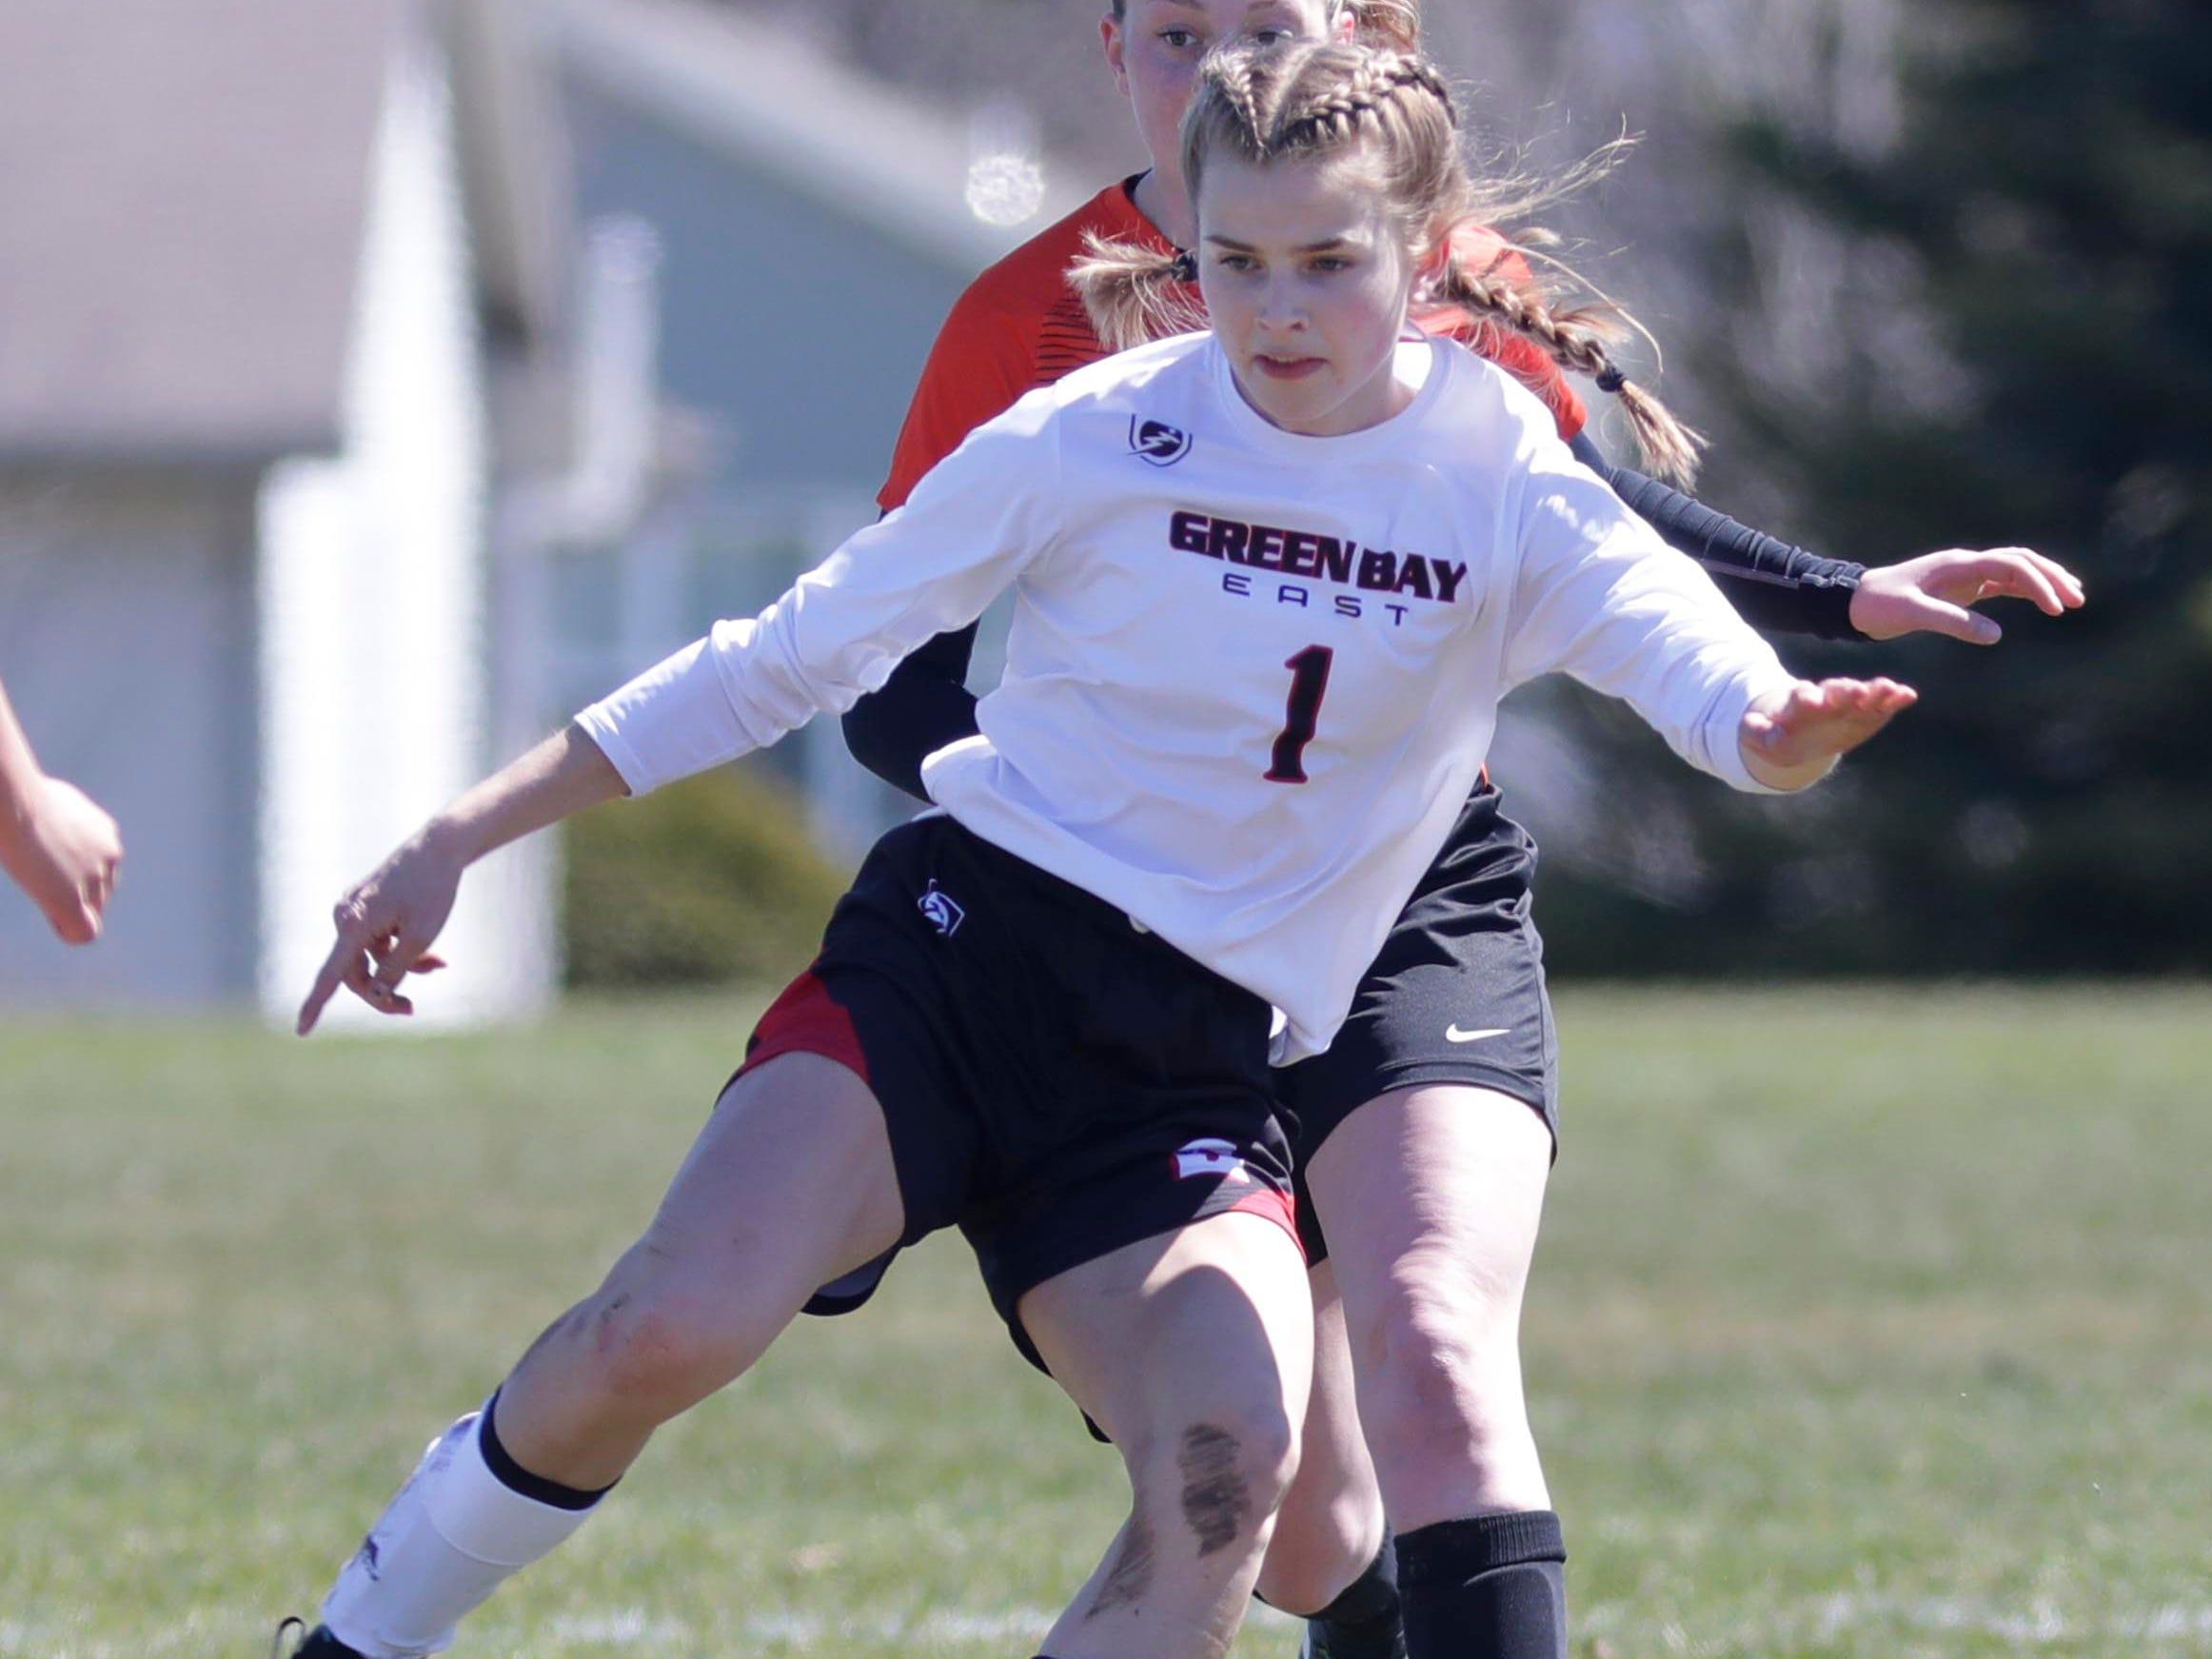 Green Bay East's Ellena Gallegas (1) moves the ball against Hartford at the Sheboygan South Soccer tournament, Saturday, April 20, 2019, in Sheboygan, Wis.